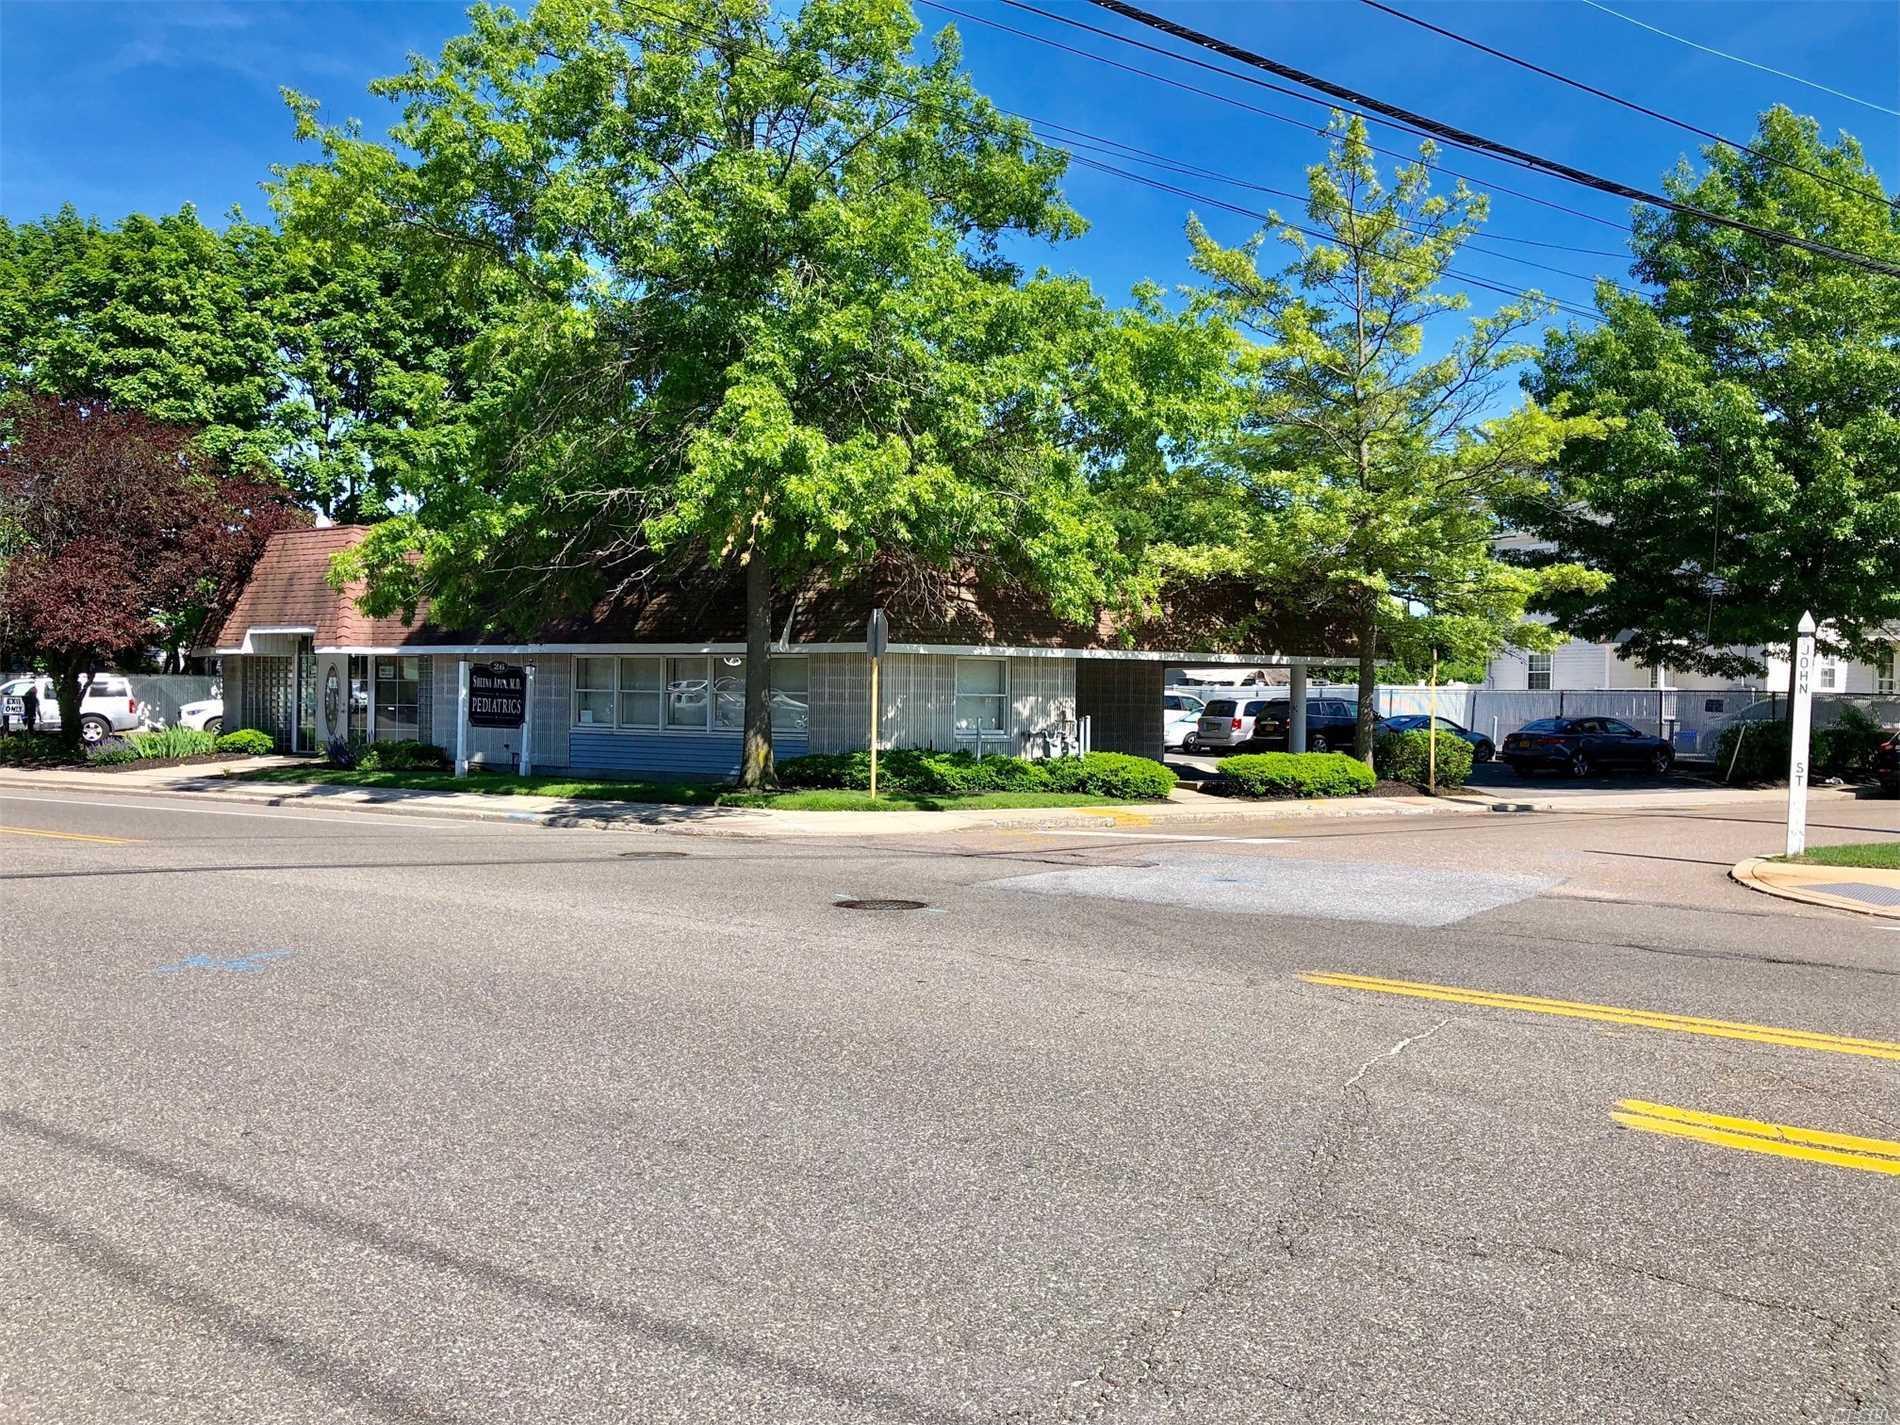 Photo of home for sale at 26 John St, Babylon NY